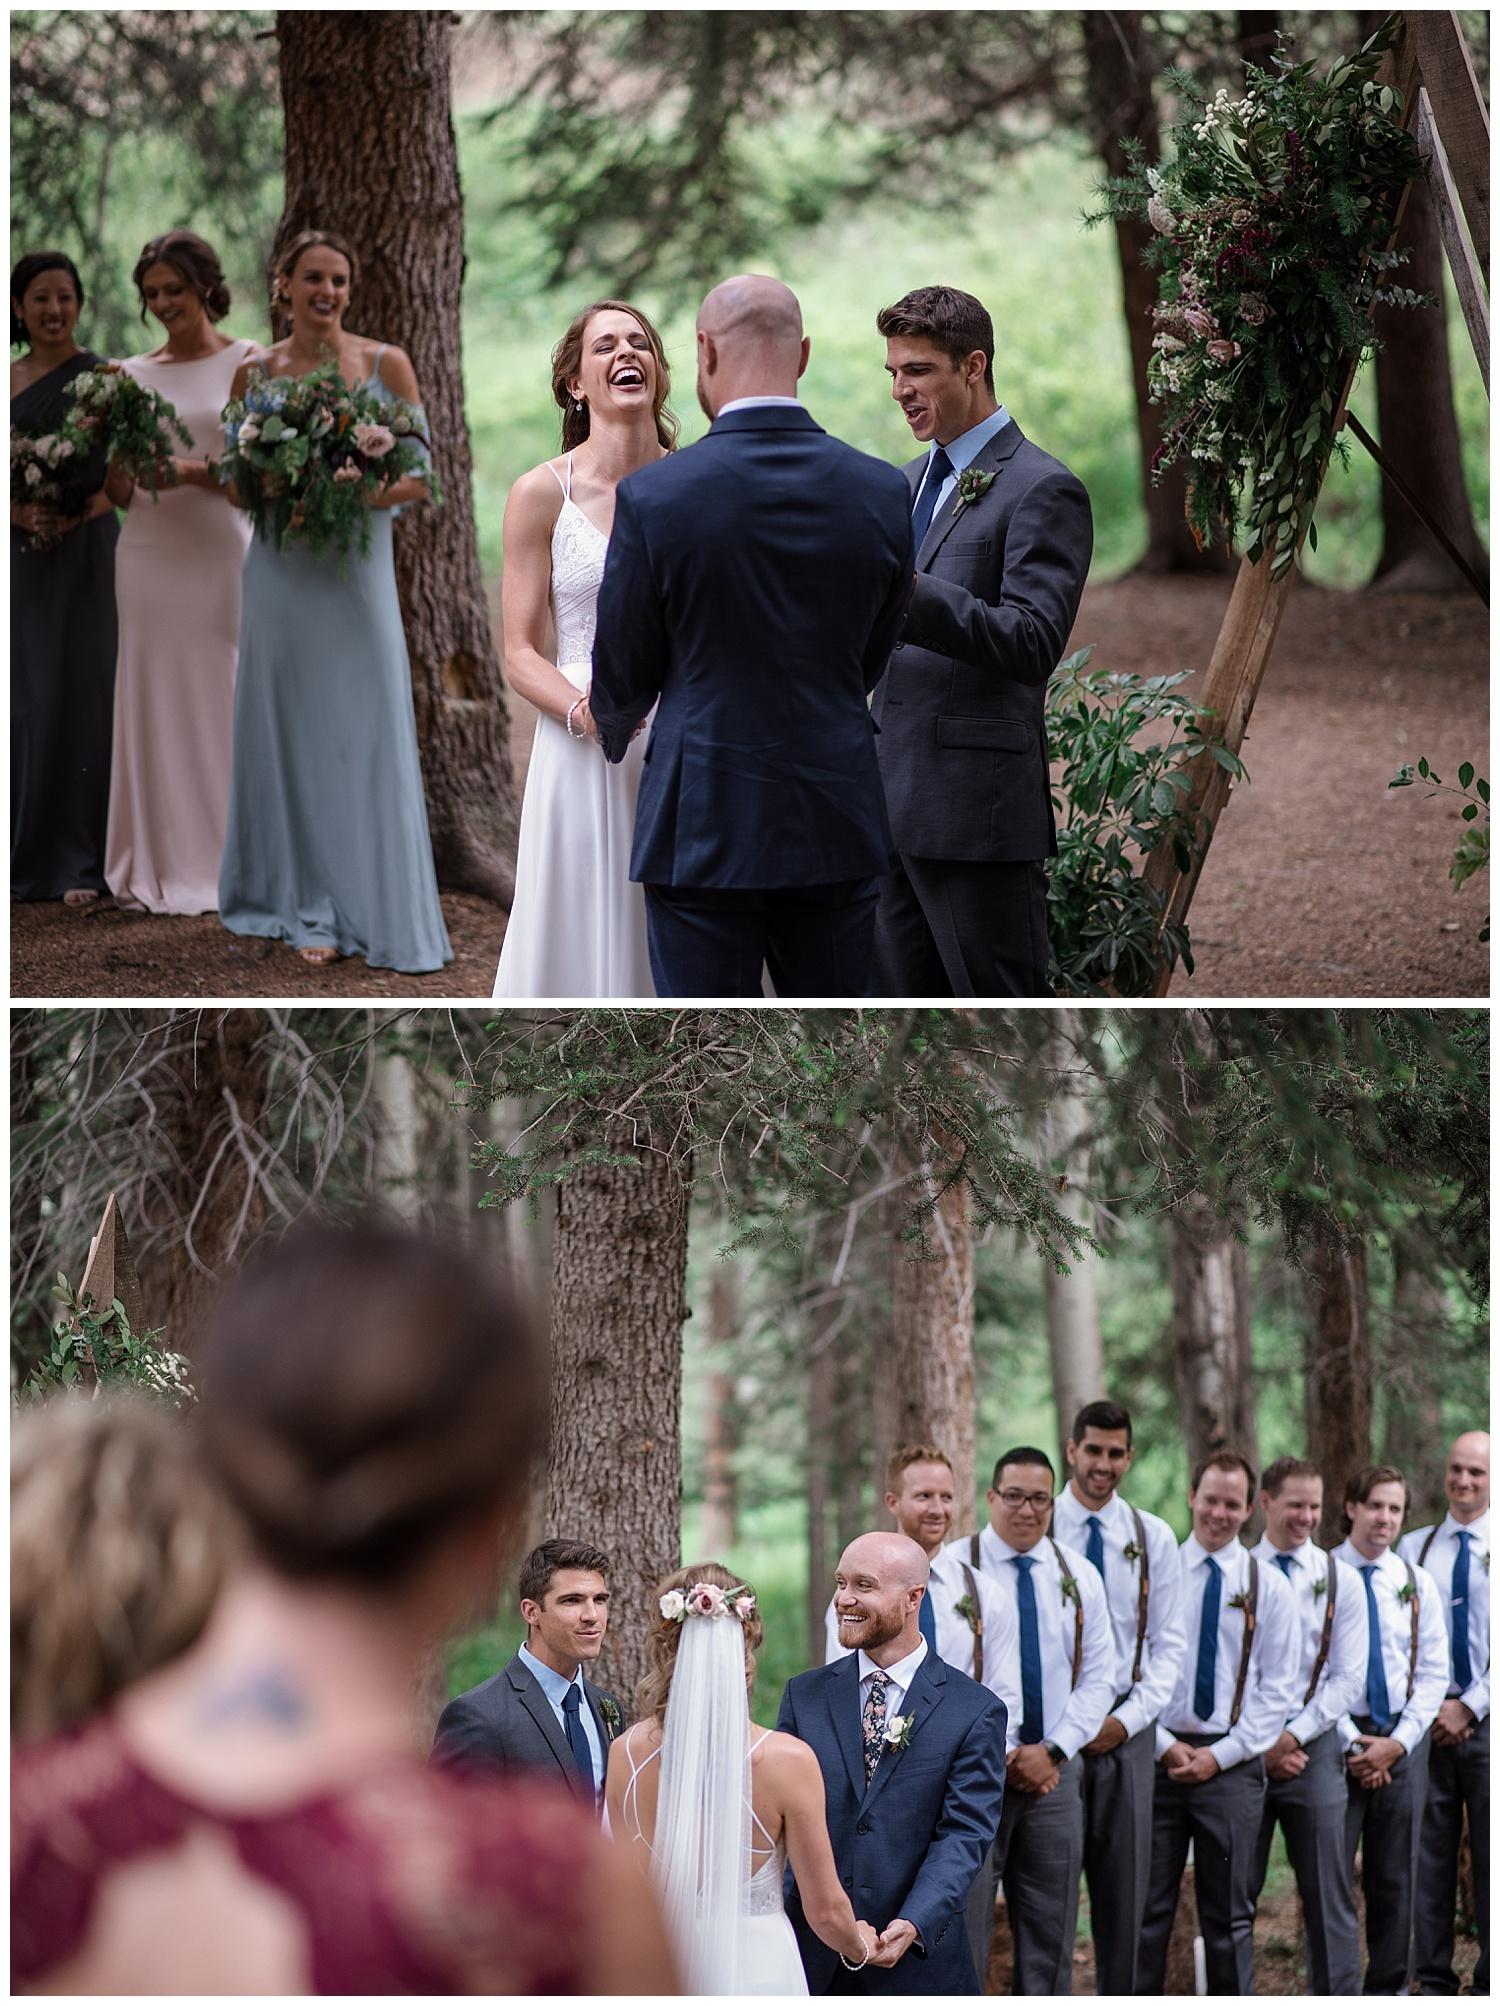 wedding ceremony at Beaver Ranch in Conifer Colorado, Colorado Wedding Photographer, Rocky Mountain Wedding Photographer, Intimate Colorado Wedding Photographer